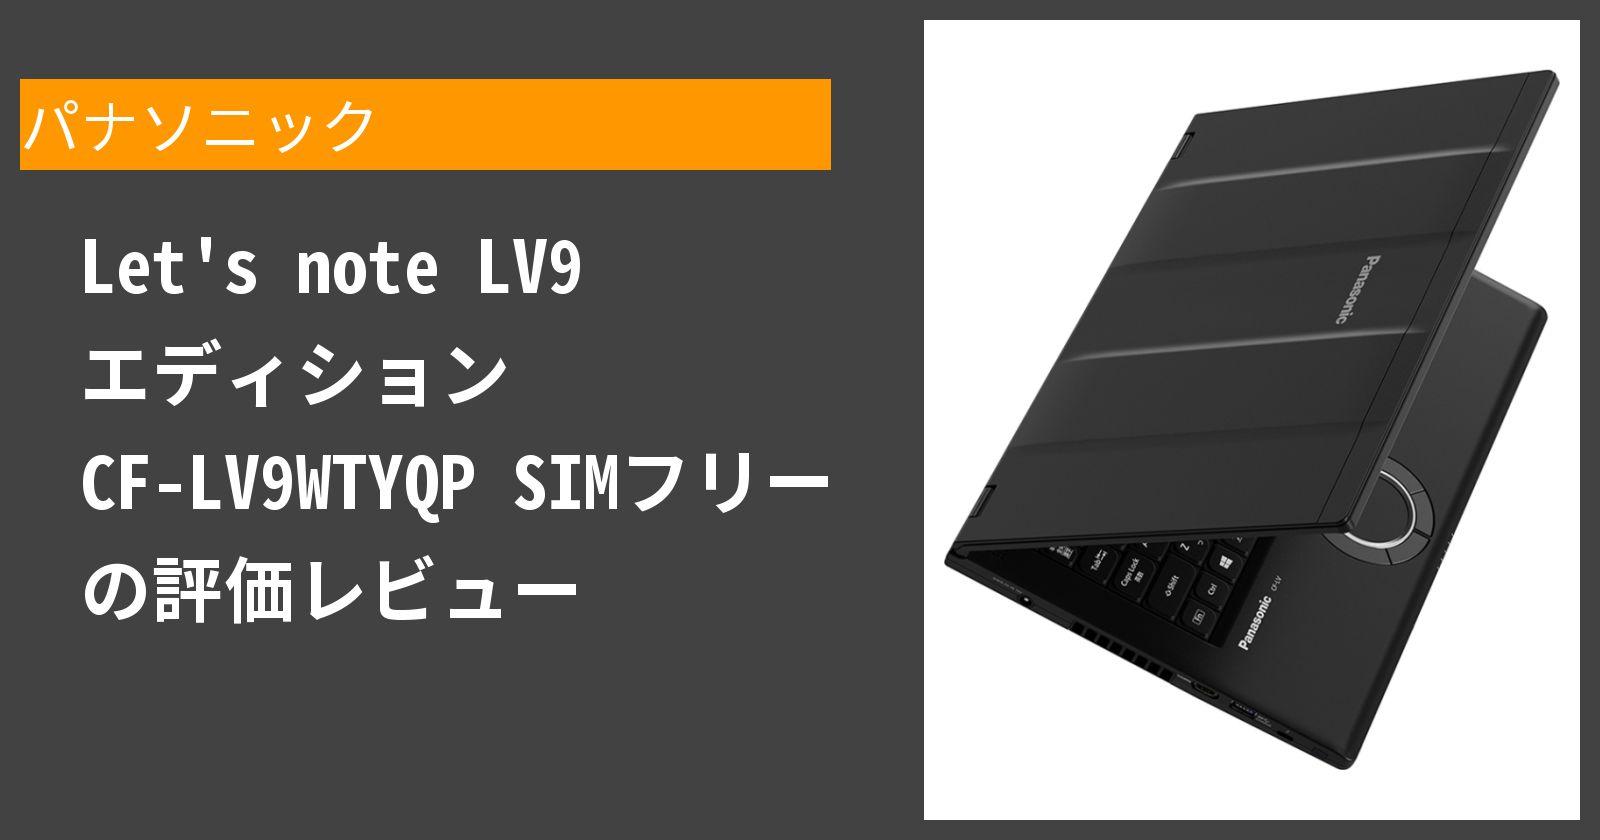 Let's note LV9 エディション CF-LV9WTYQP SIMフリーを徹底評価